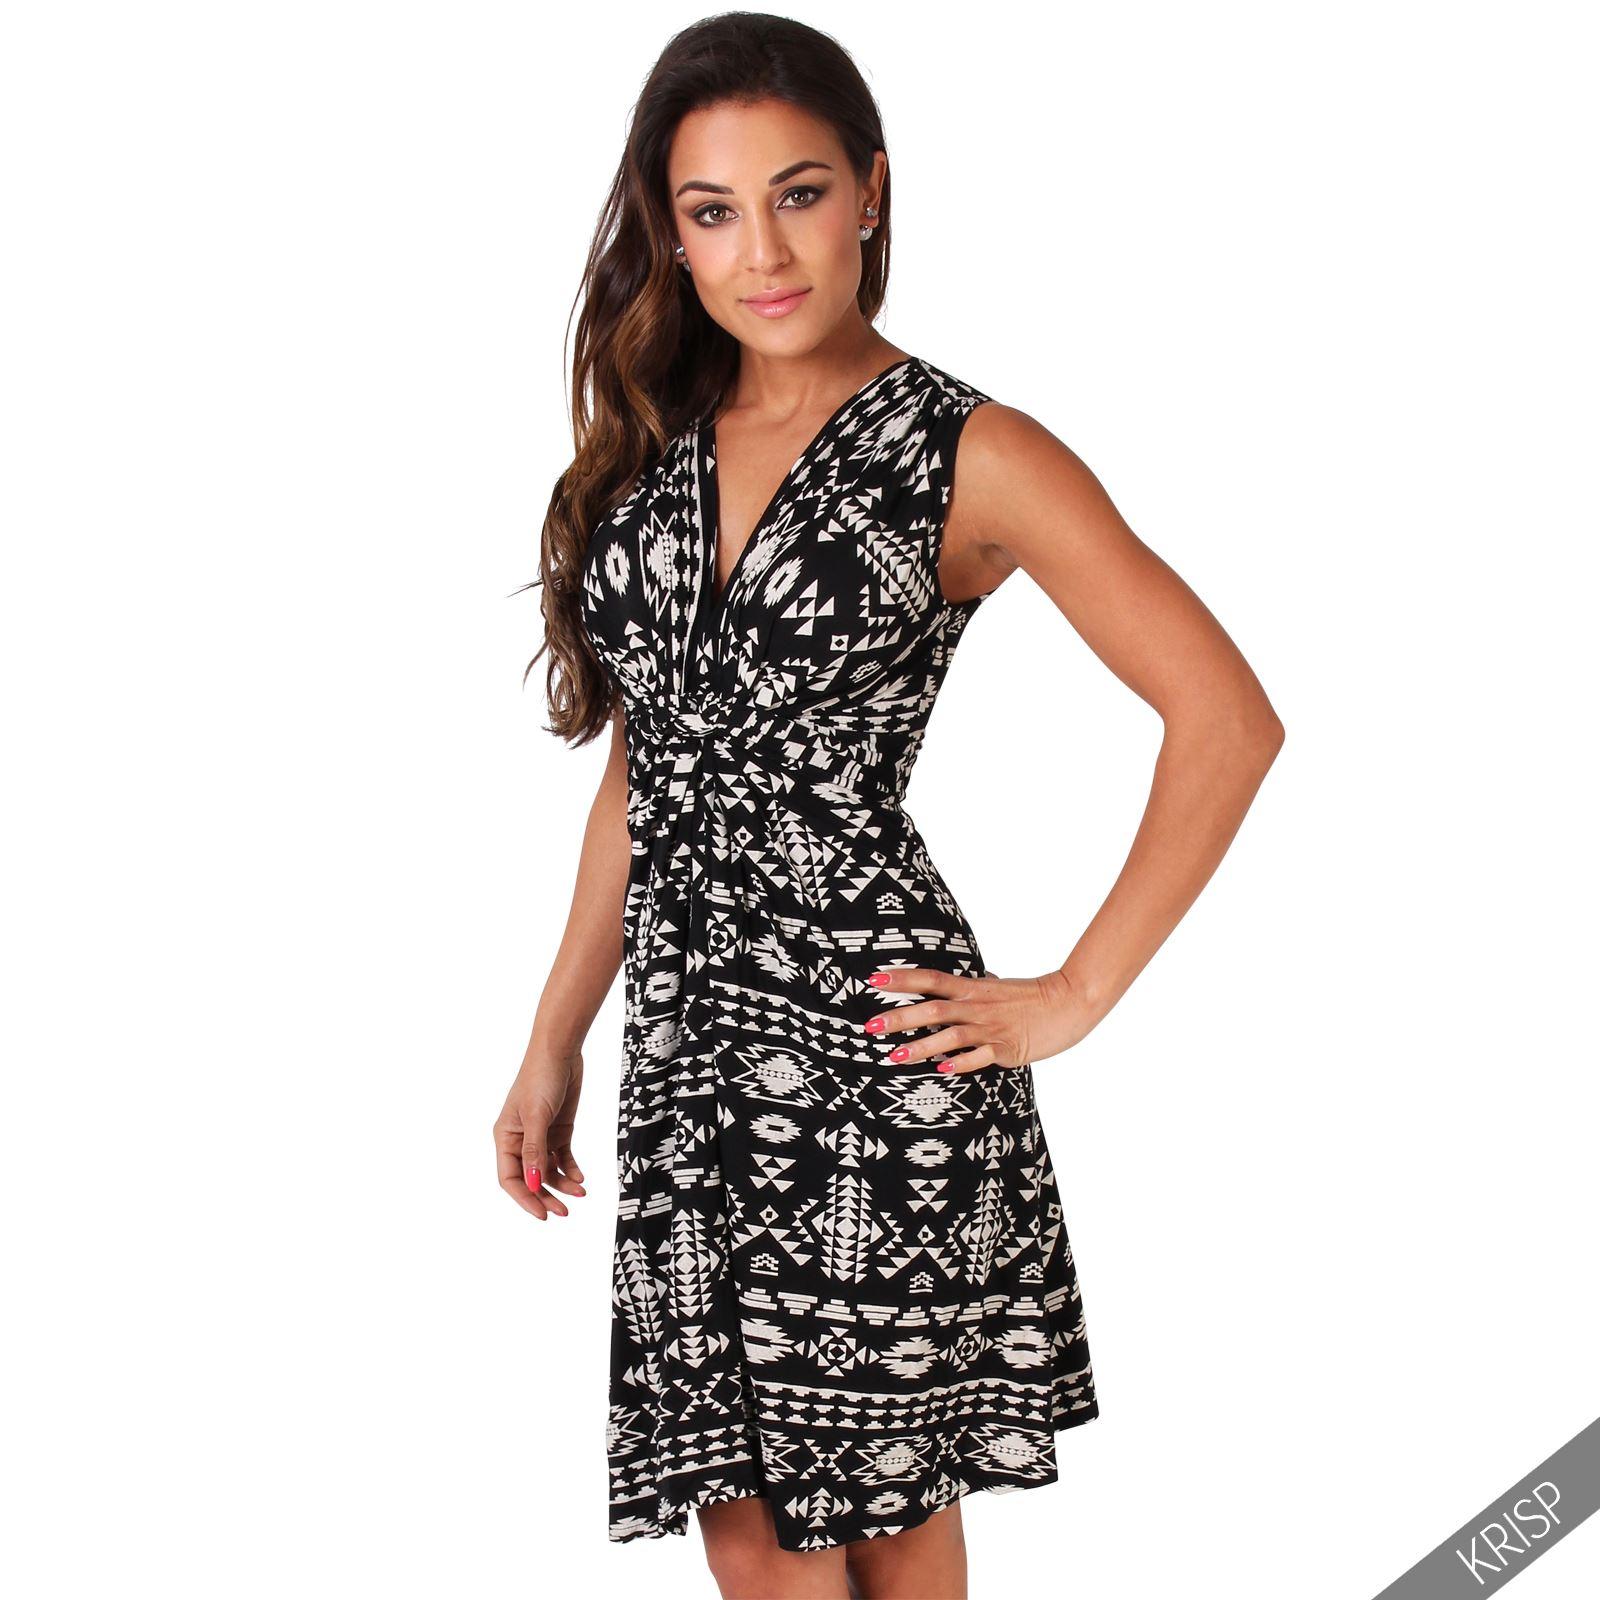 Womens-V-Neck-Mini-Dress-Small-Sizes-Short-Skirt-Tribal-Print-Front-Knot-Party thumbnail 15